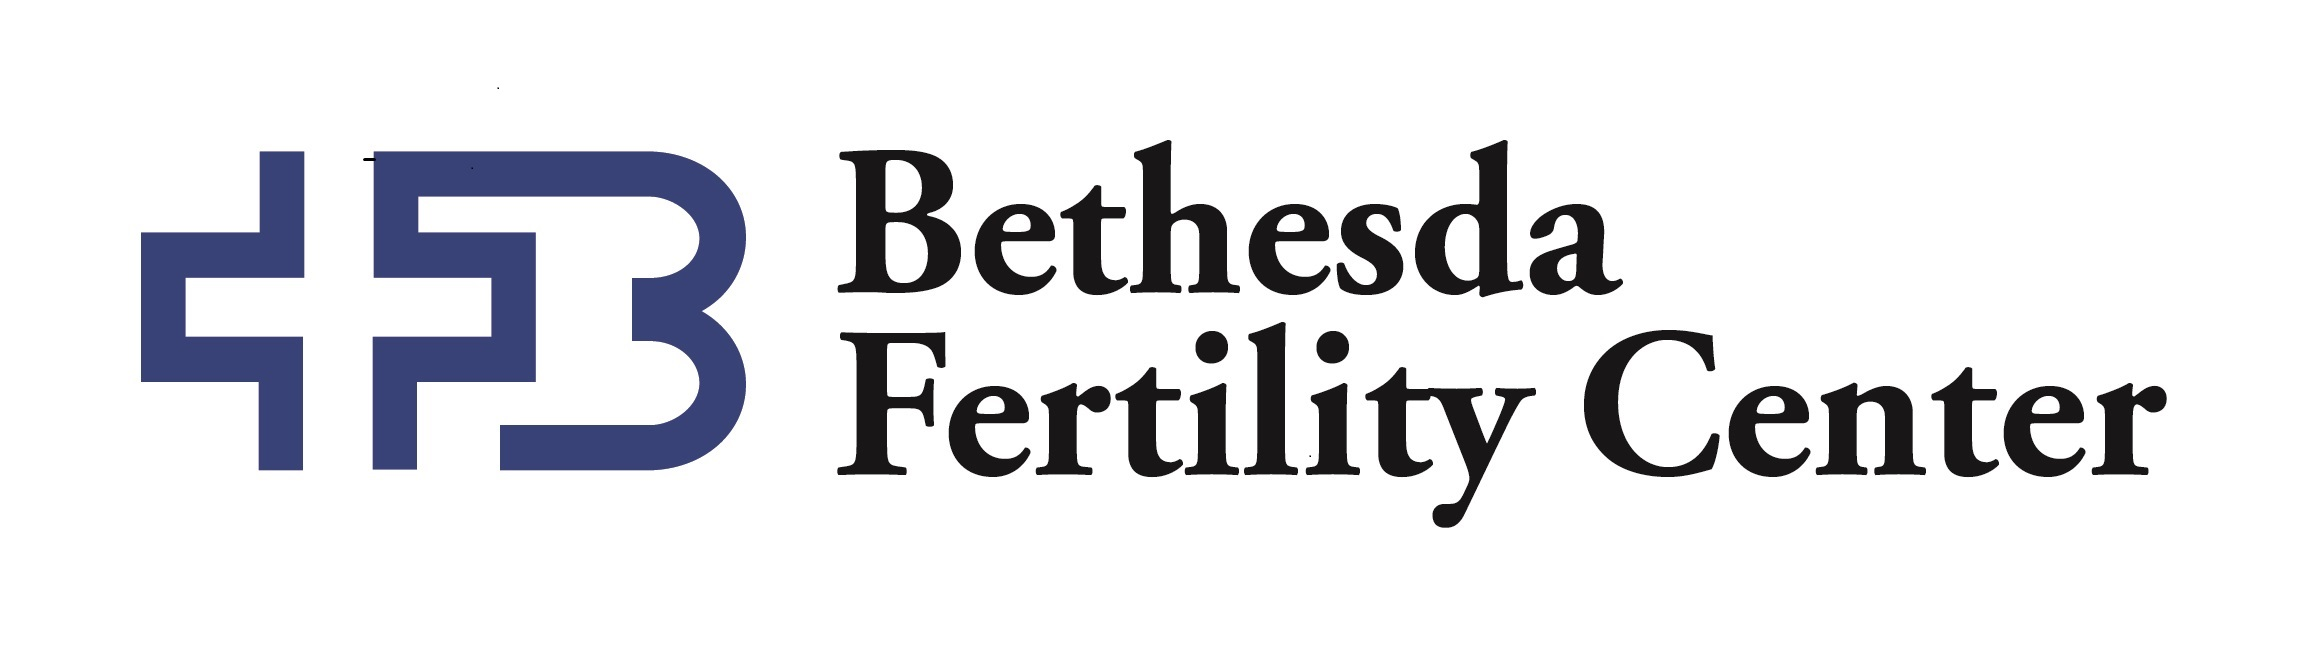 Bethesda Fertility Center